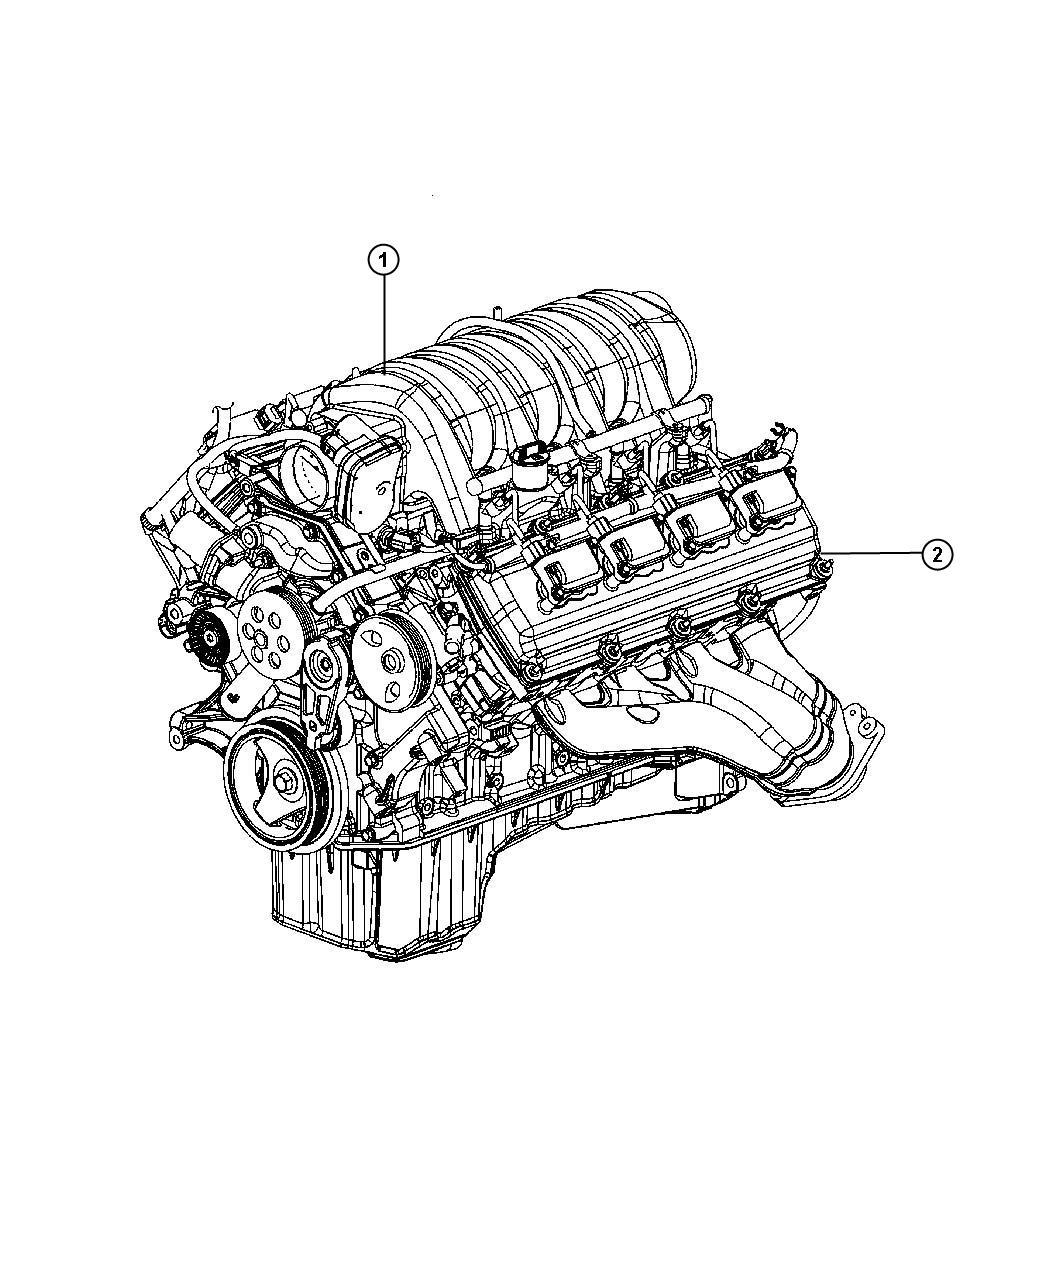 Chrysler 300 Engine. Long block. Remanufactured. Hemi